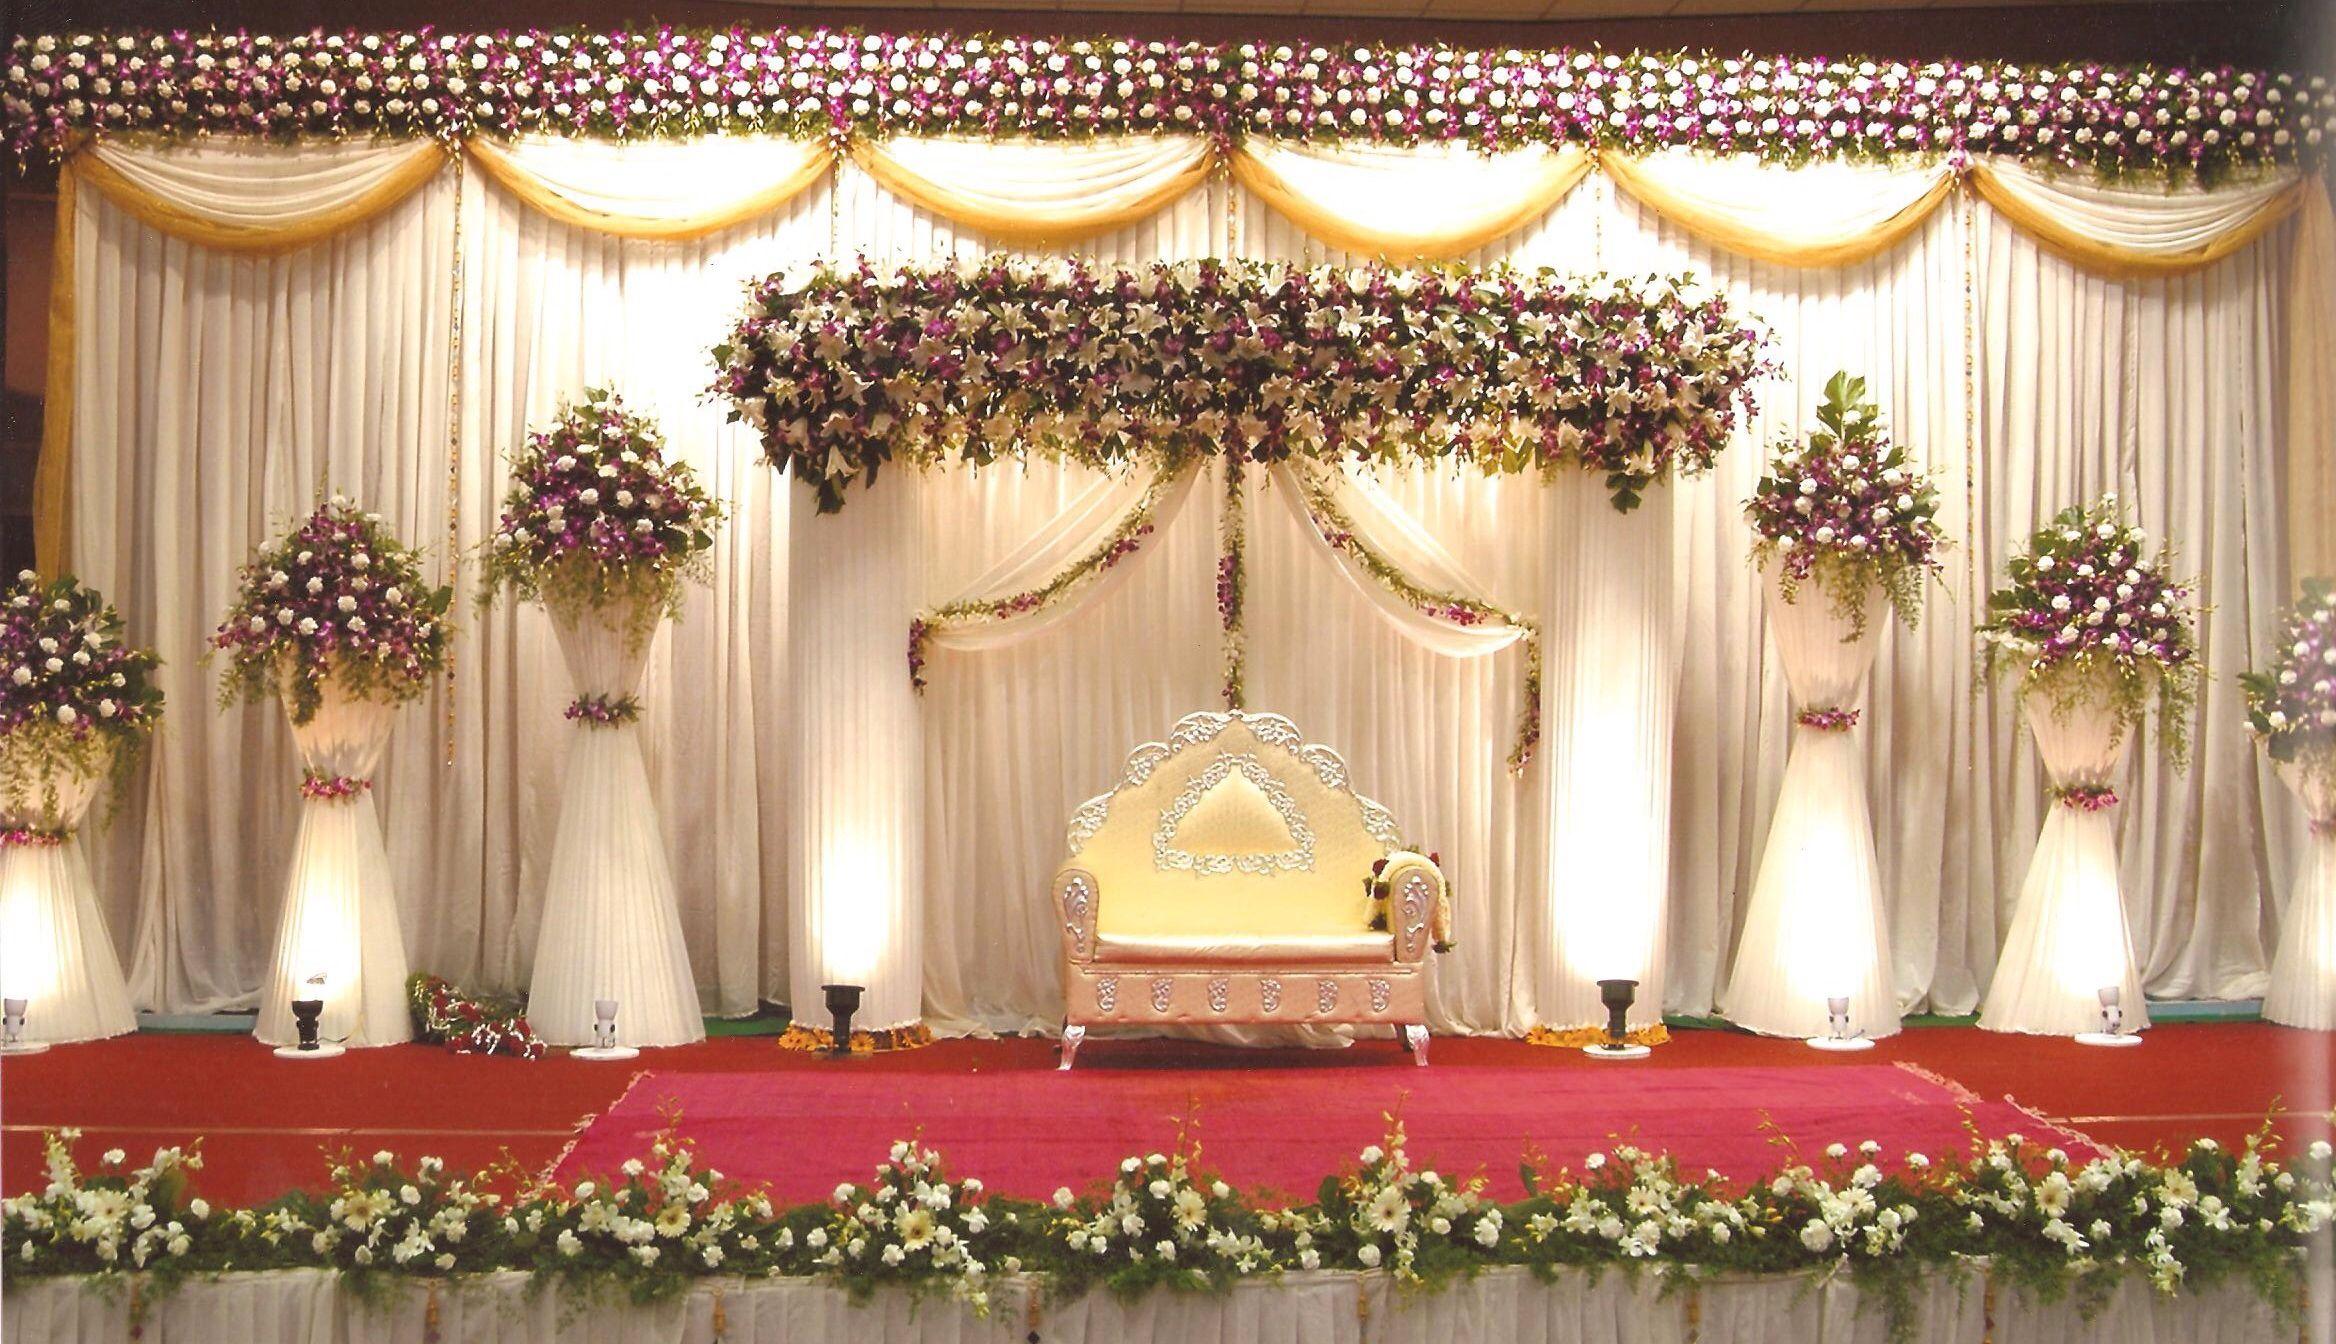 wedding setup Google Search Wedding Pinterest Planners